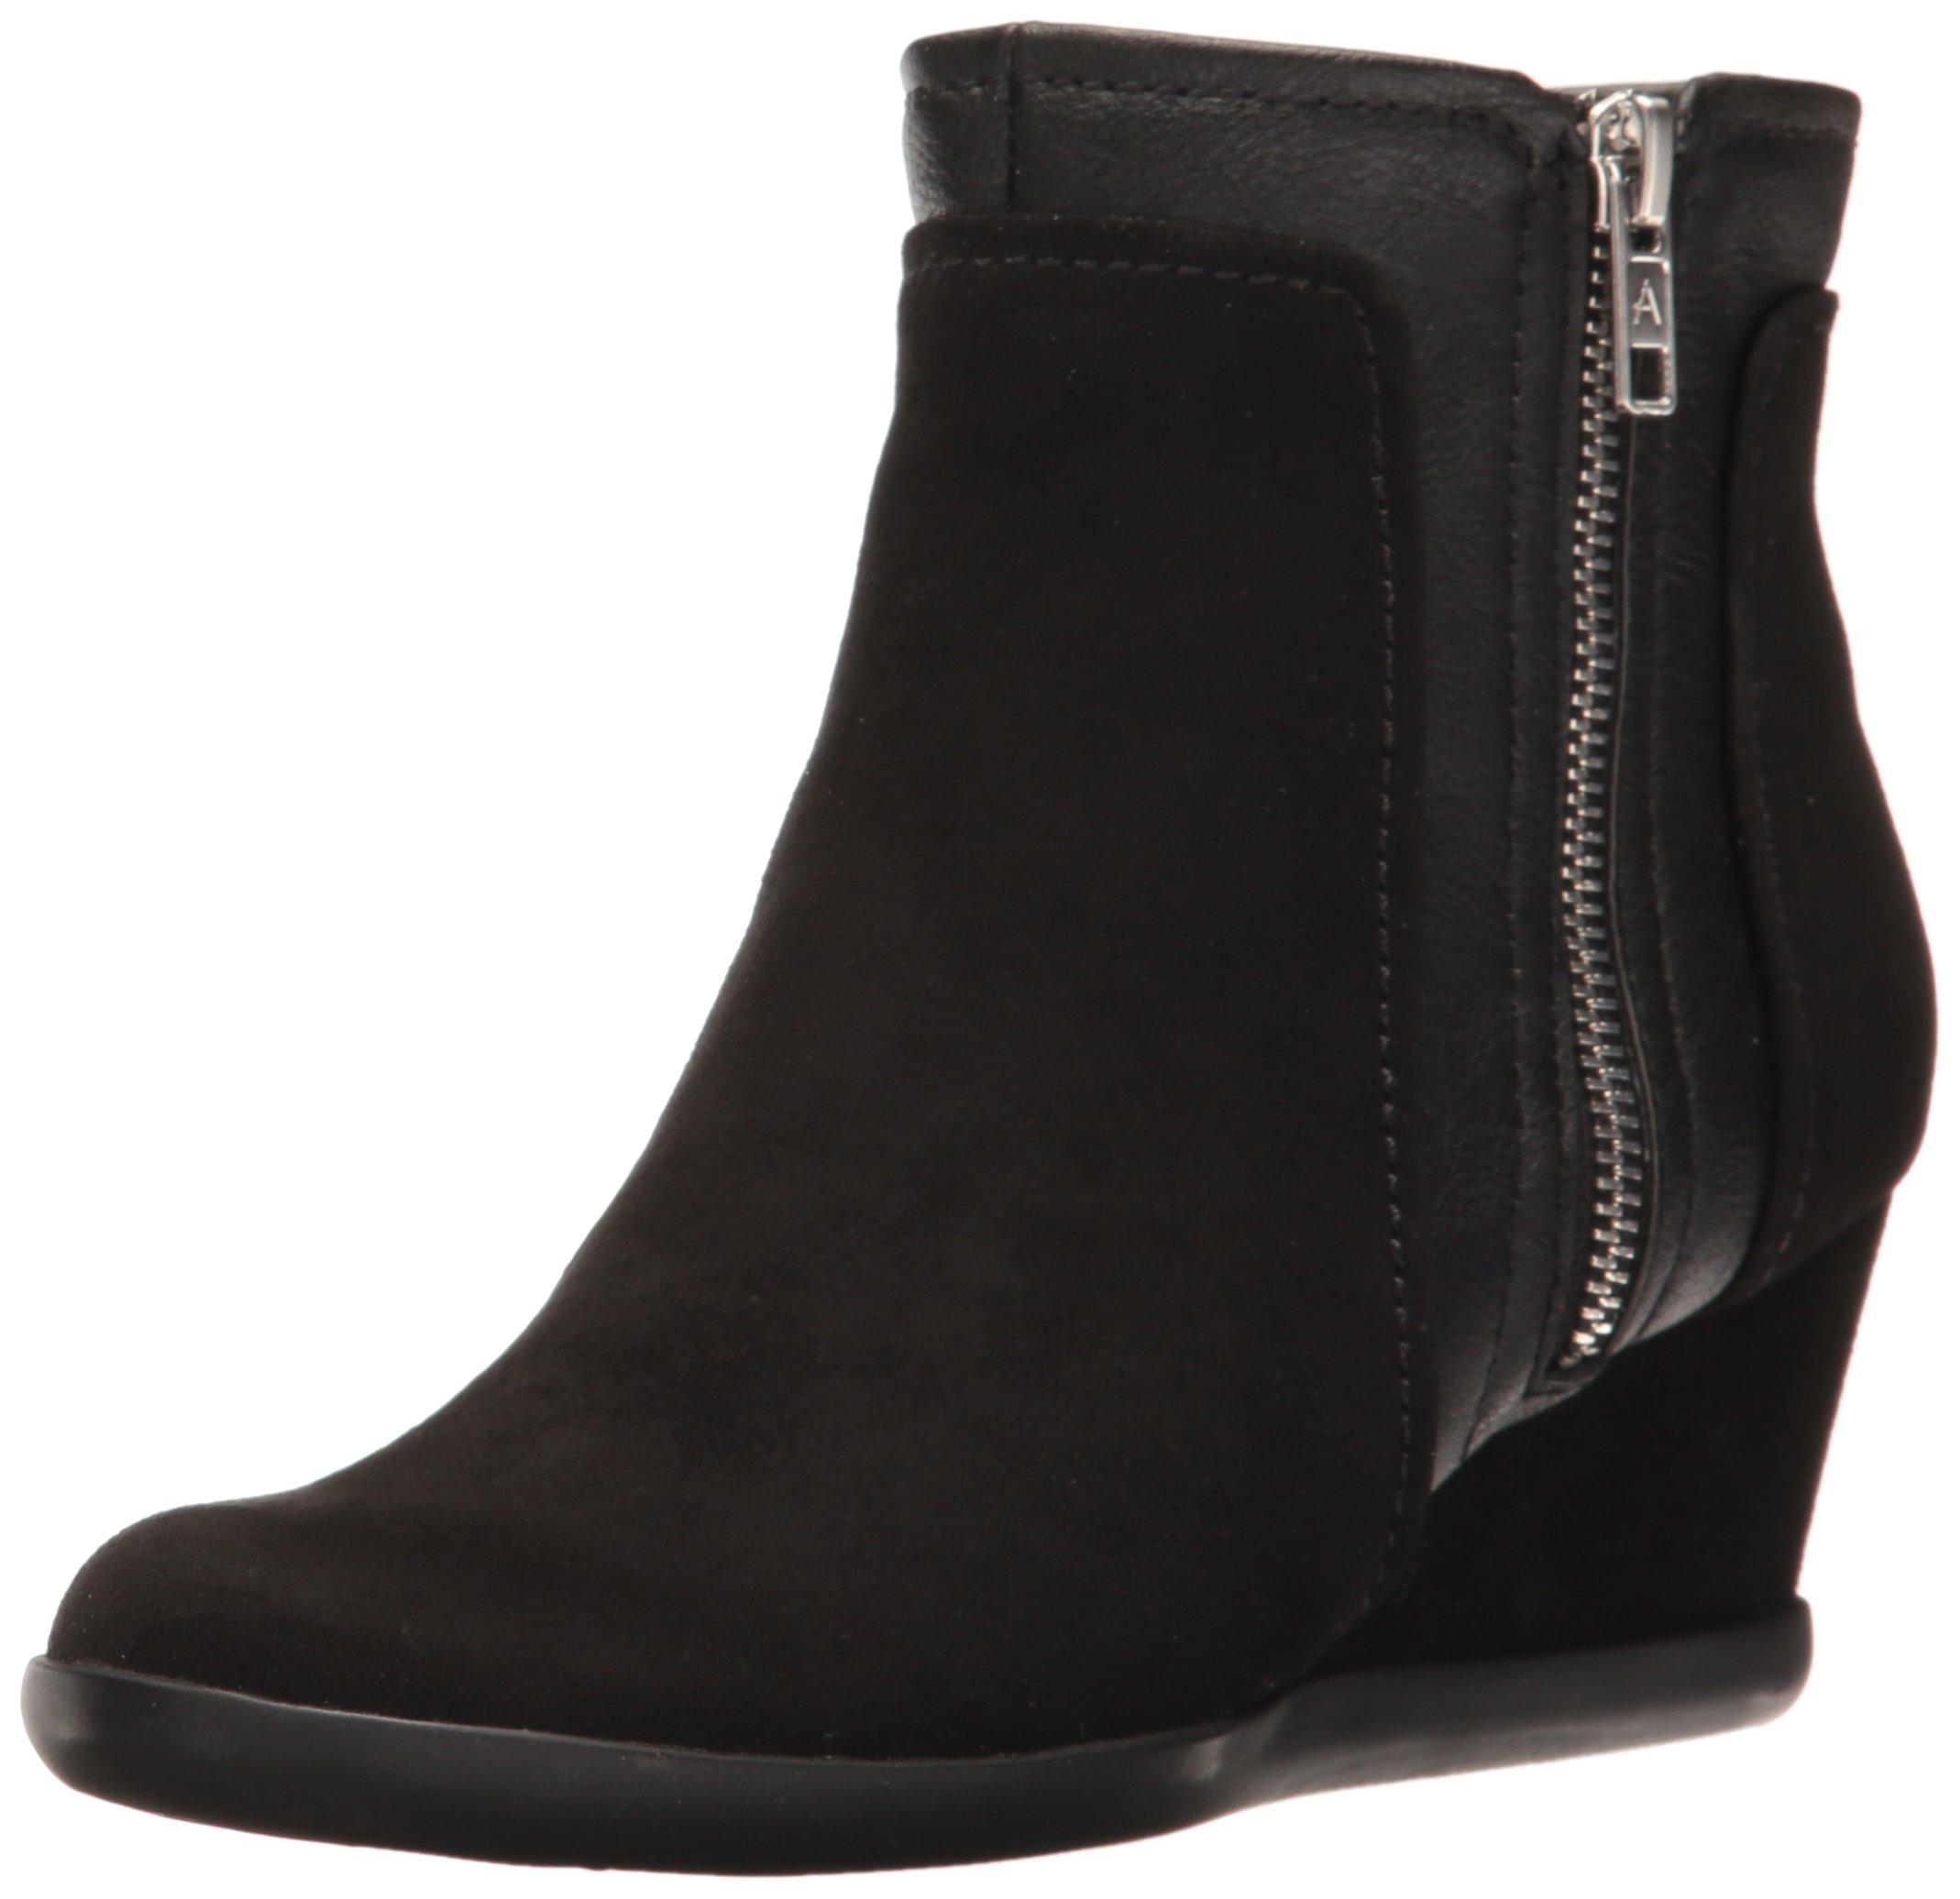 Aerosoles Women's Outfit Boot,Black Combo,10 M US